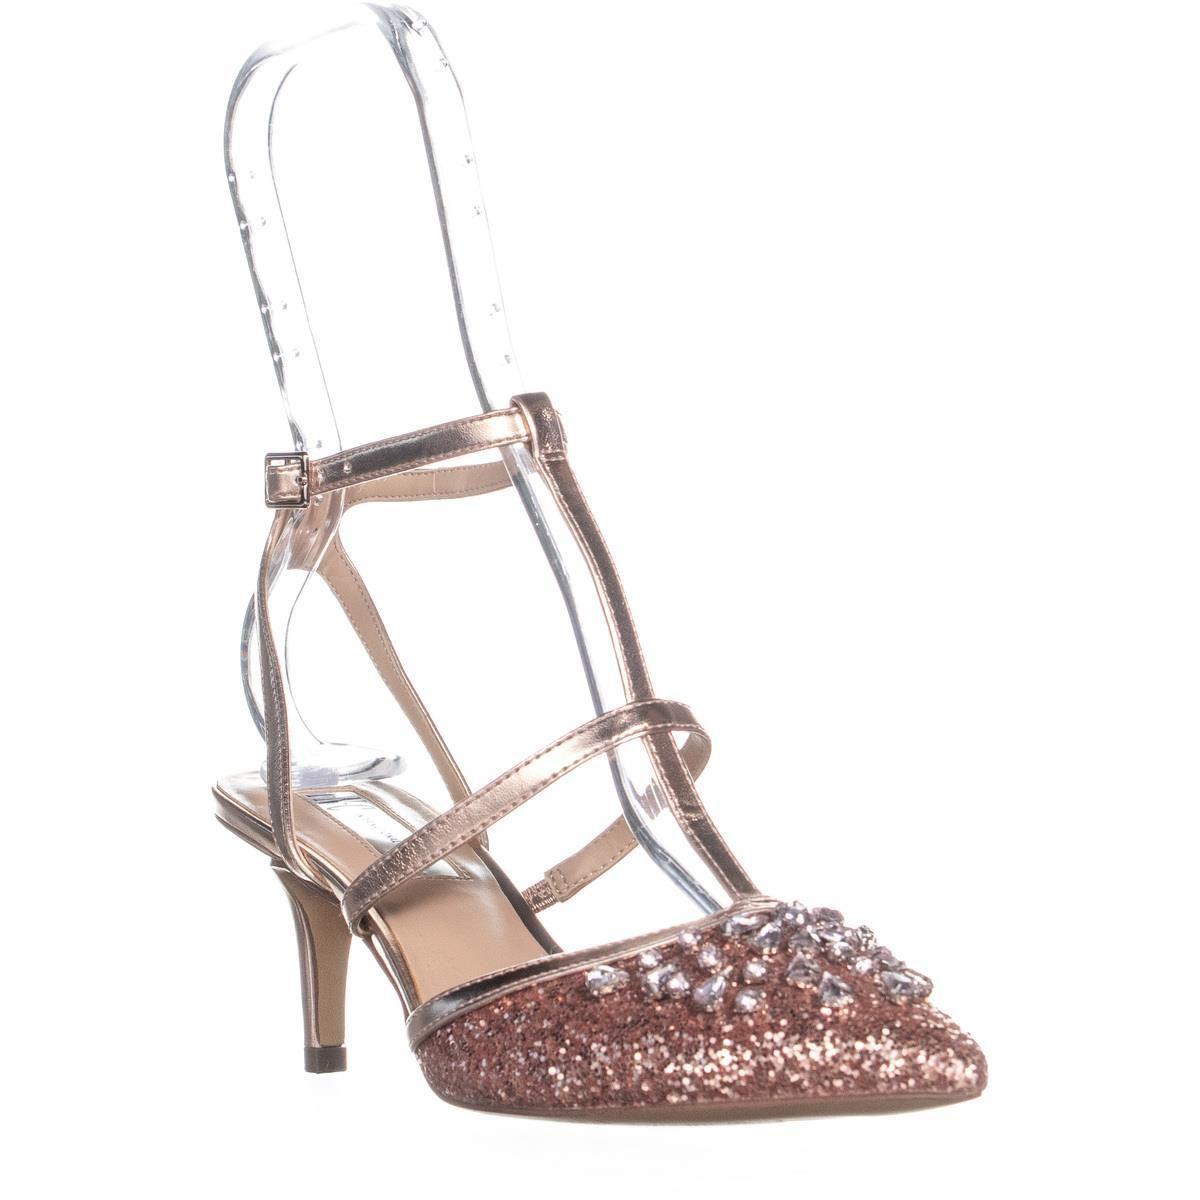 47eb4465ef3 INC International Concepts. Women s I35 Carma5 Rhinestone T Strap Sandals